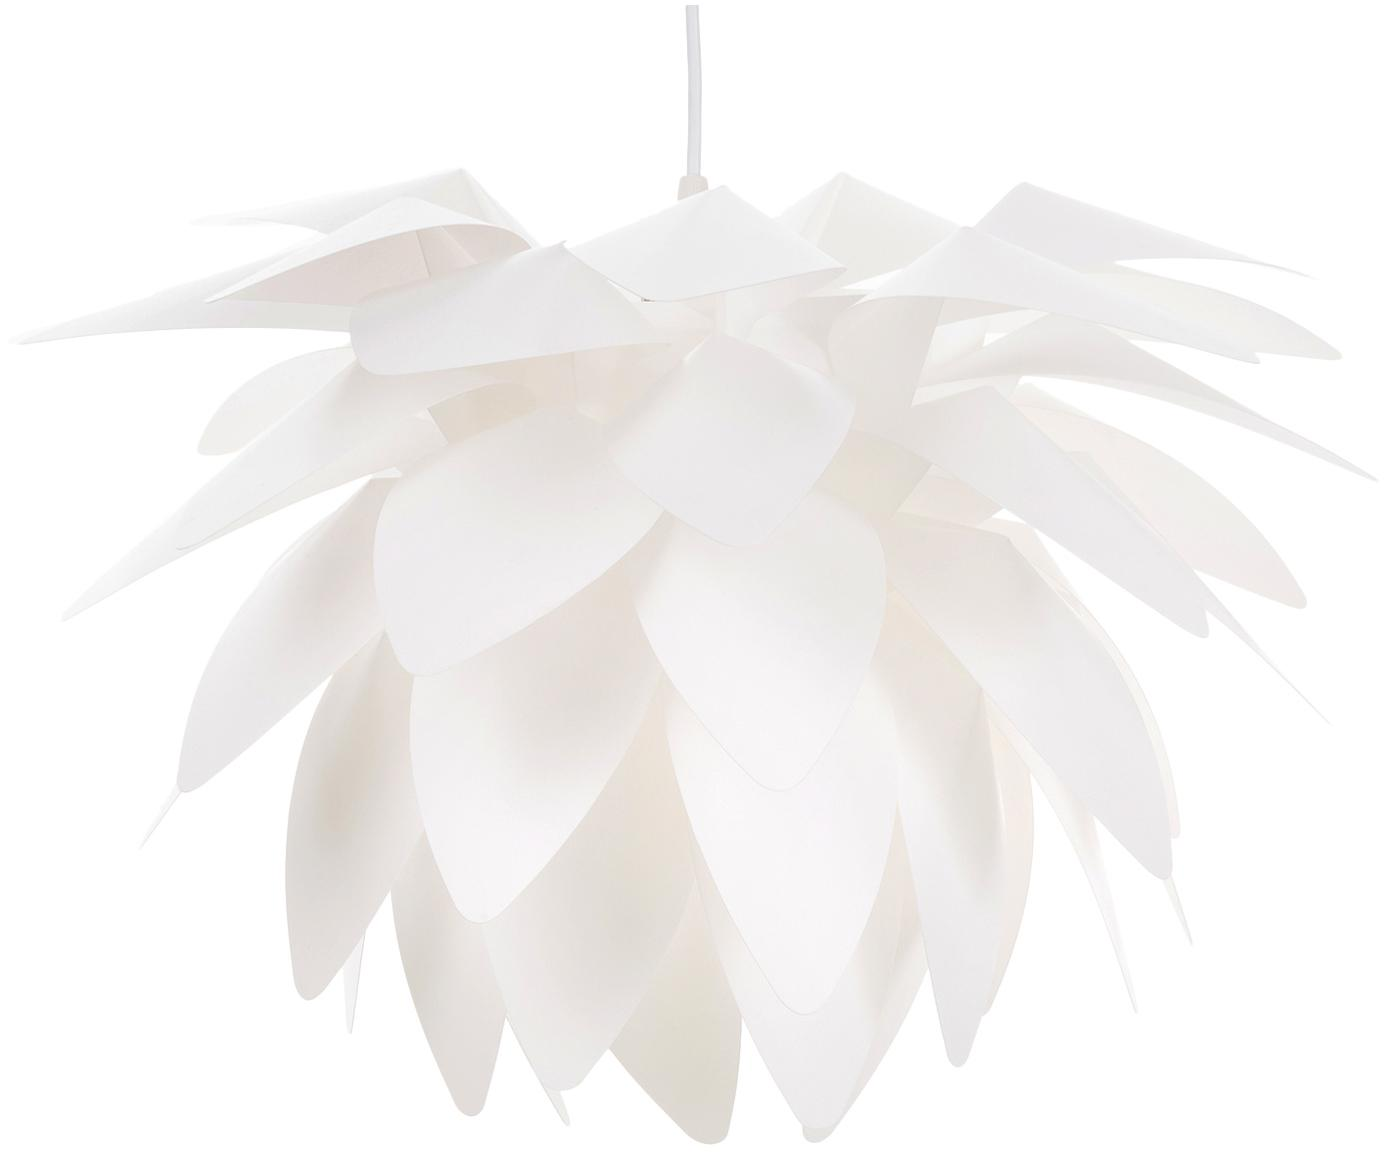 Lampada a sospensione Cactus, Materiale sintetico, Bianco, Ø 43 x Alt. 41 cm